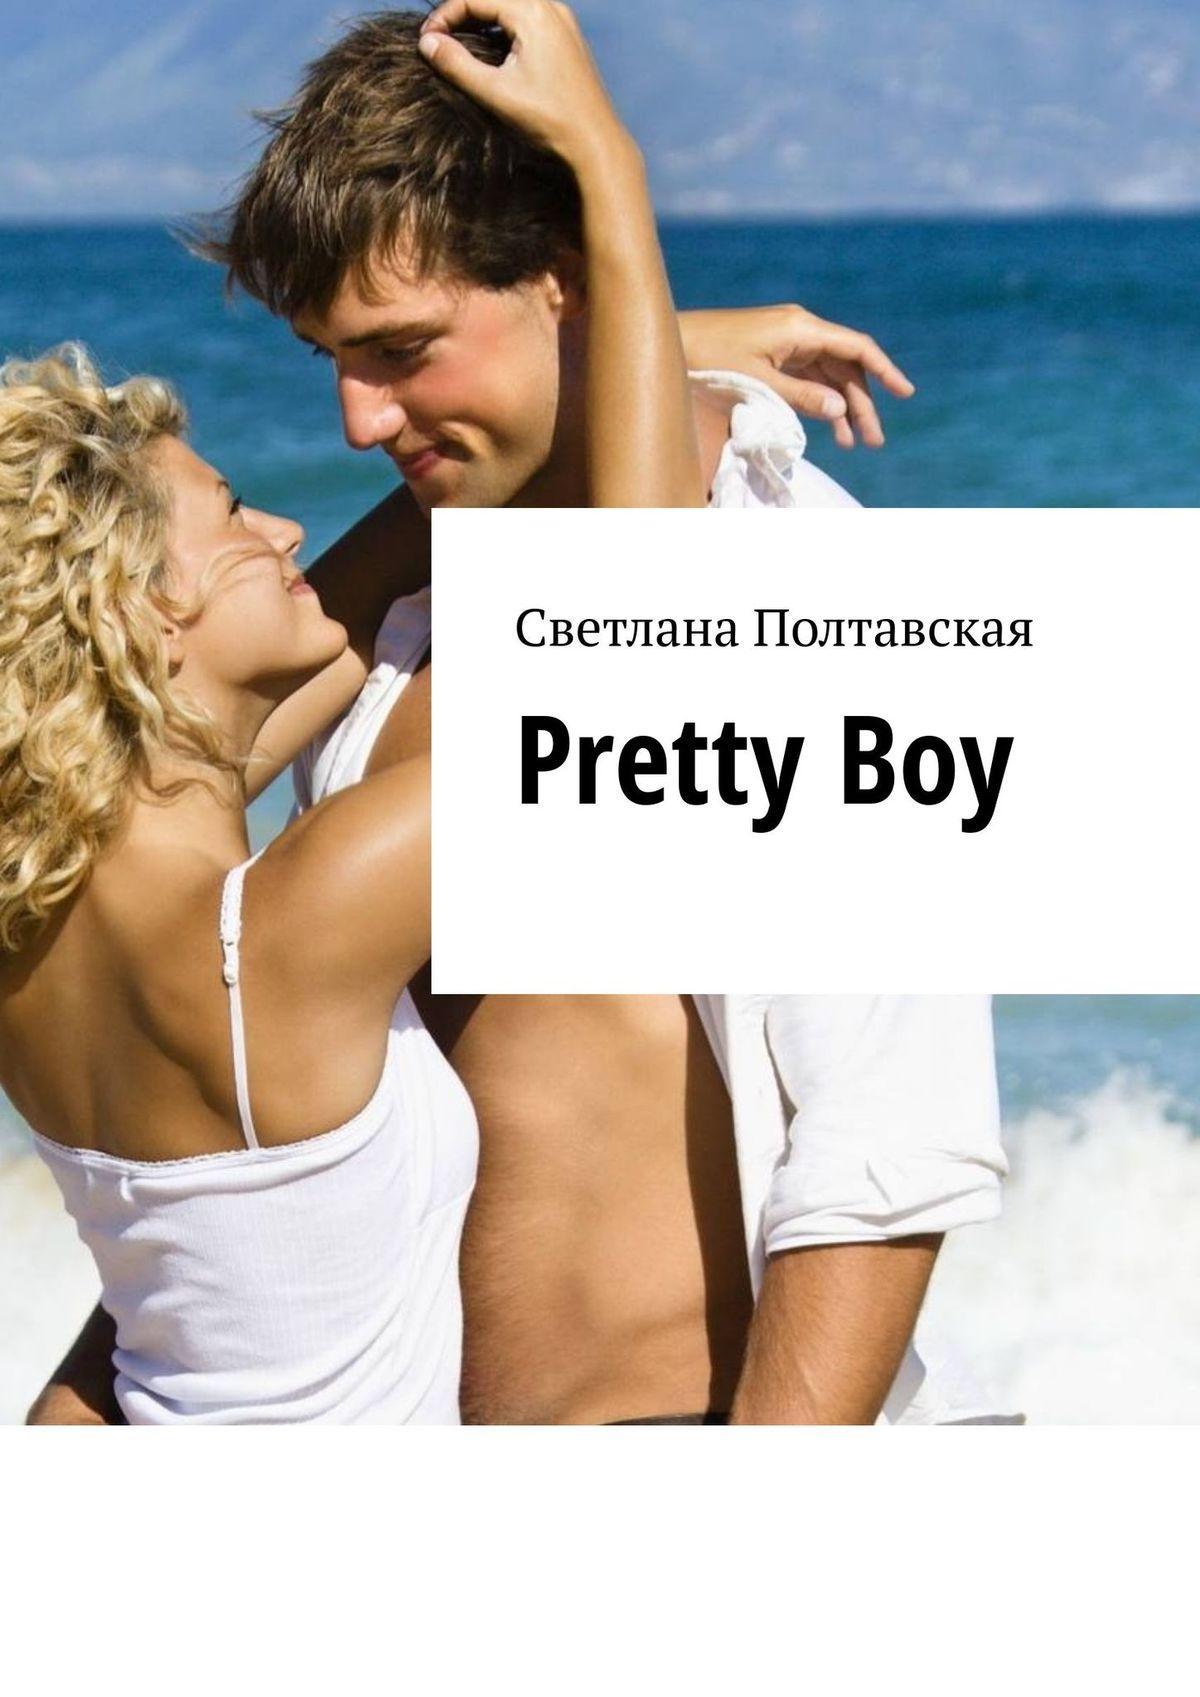 Светлана Полтавская Pretty Boy